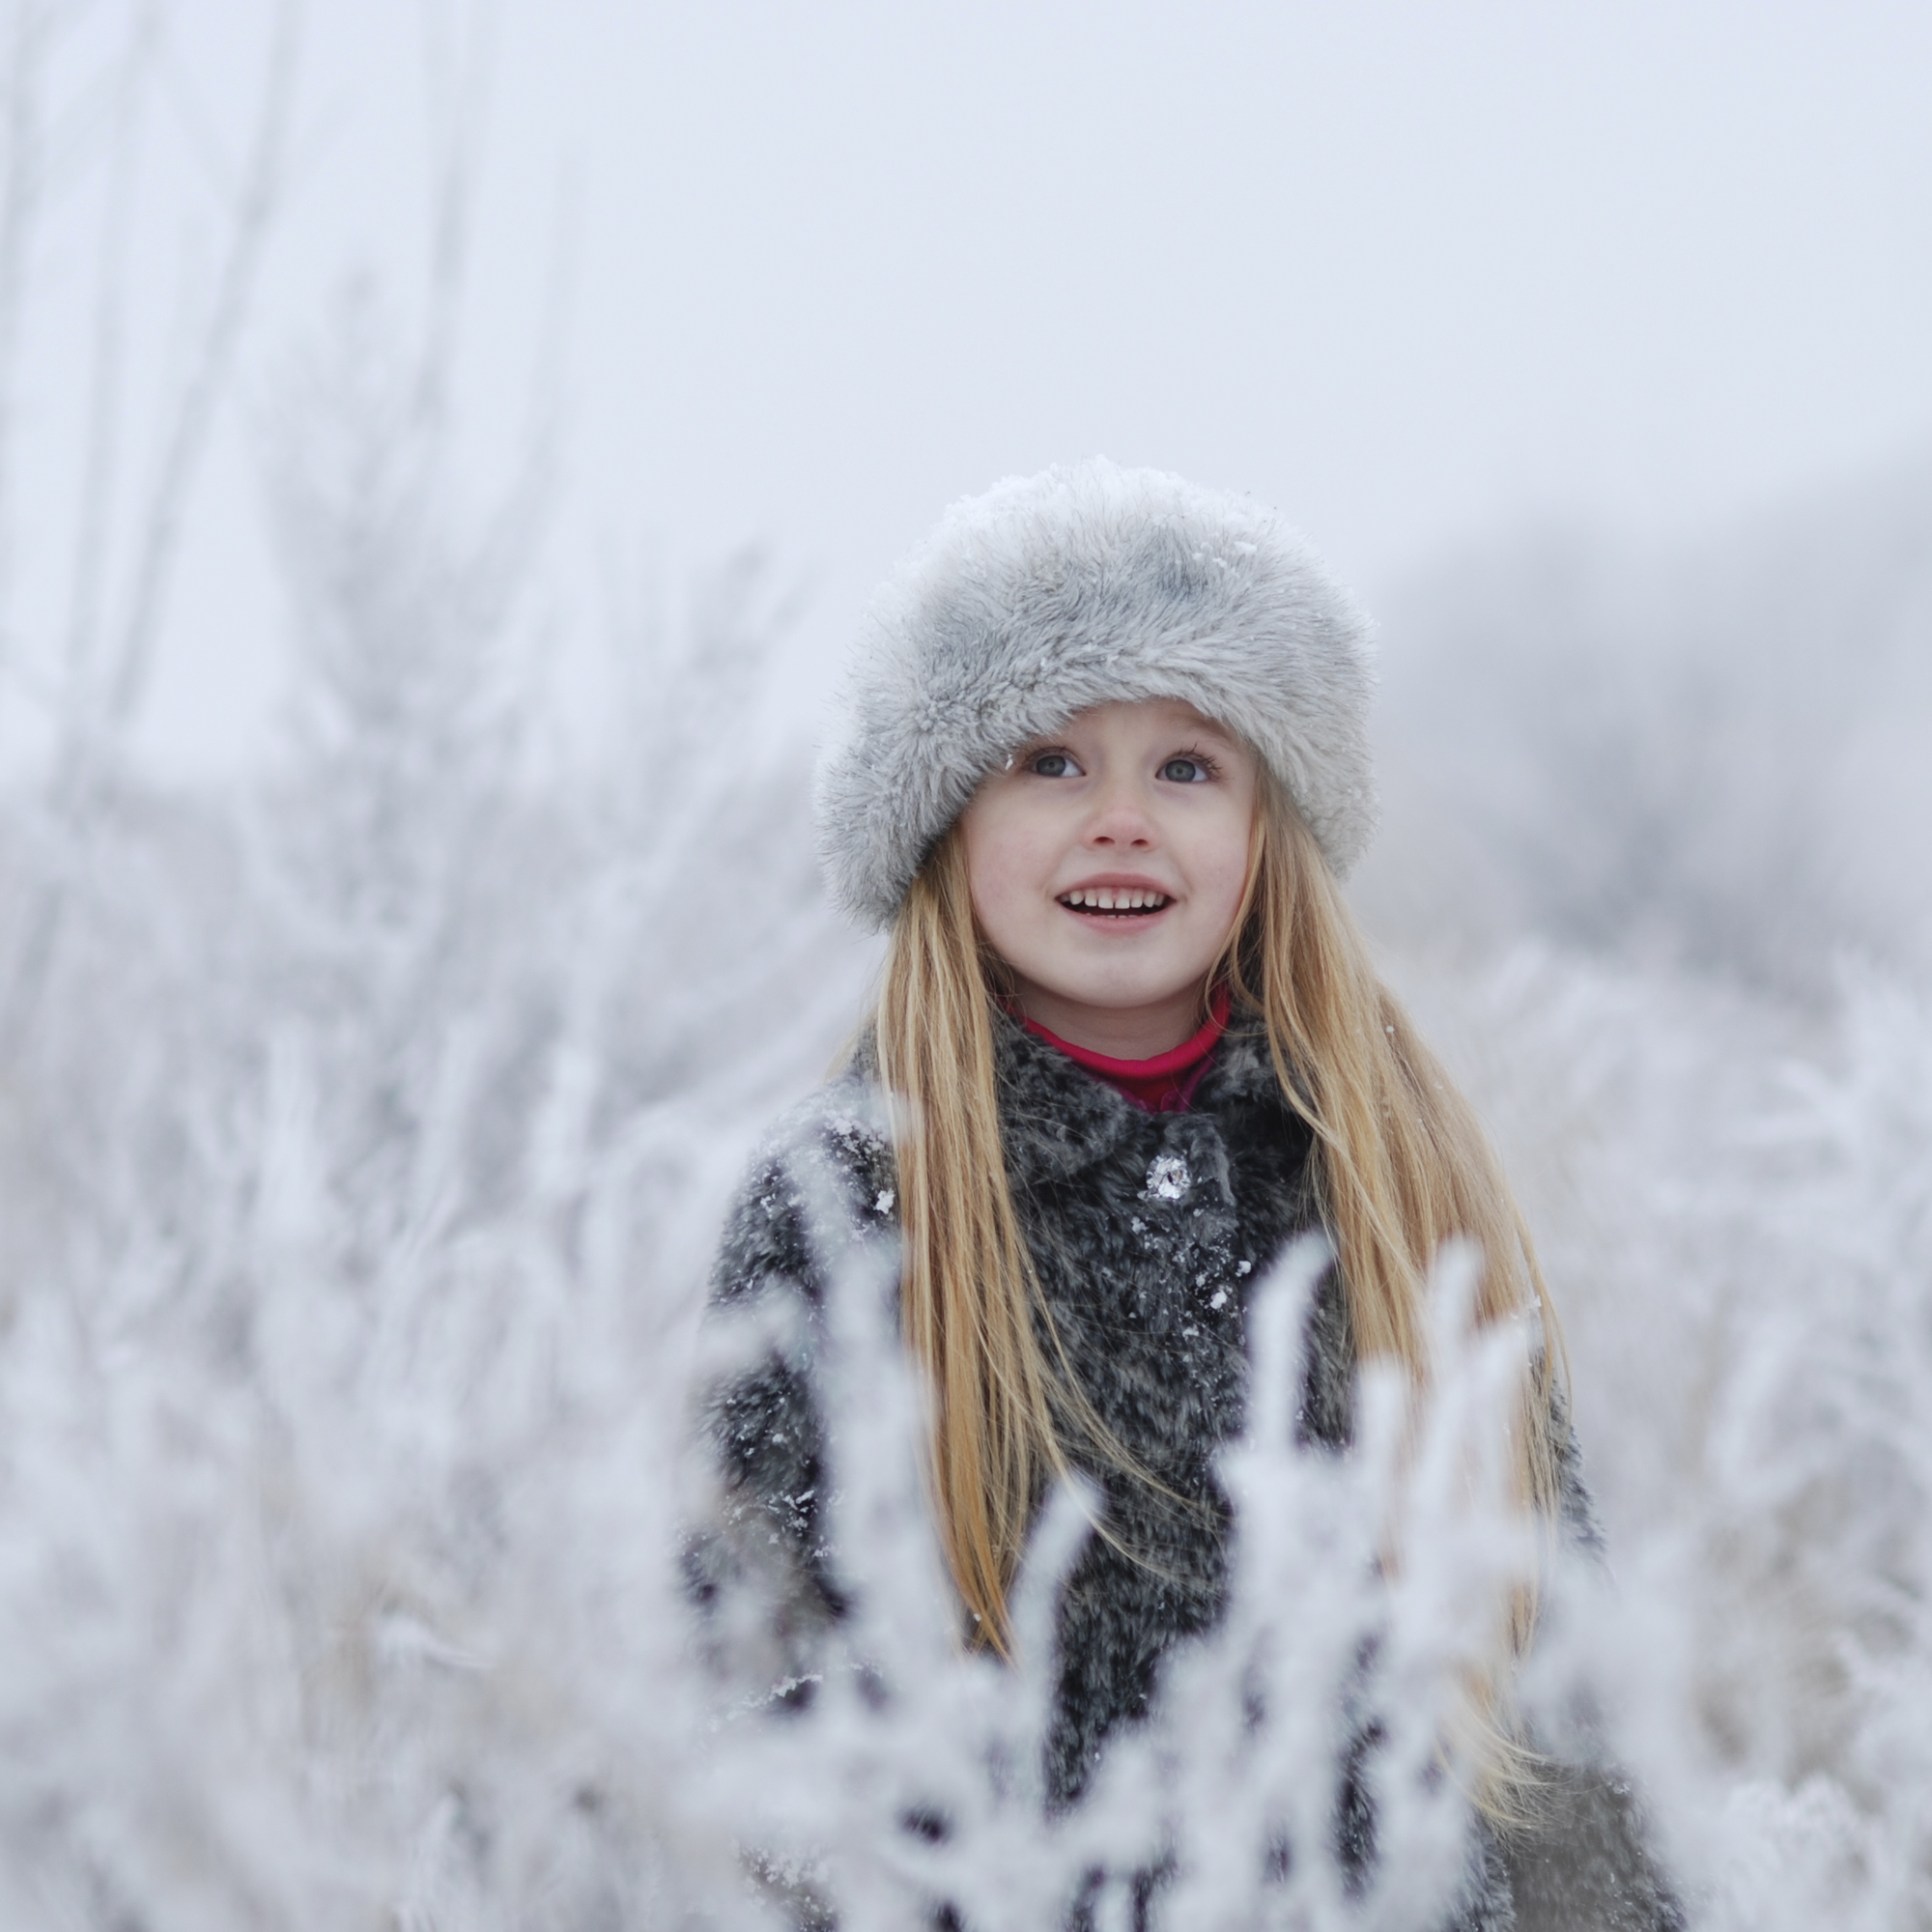 Frosty morning. winter_4